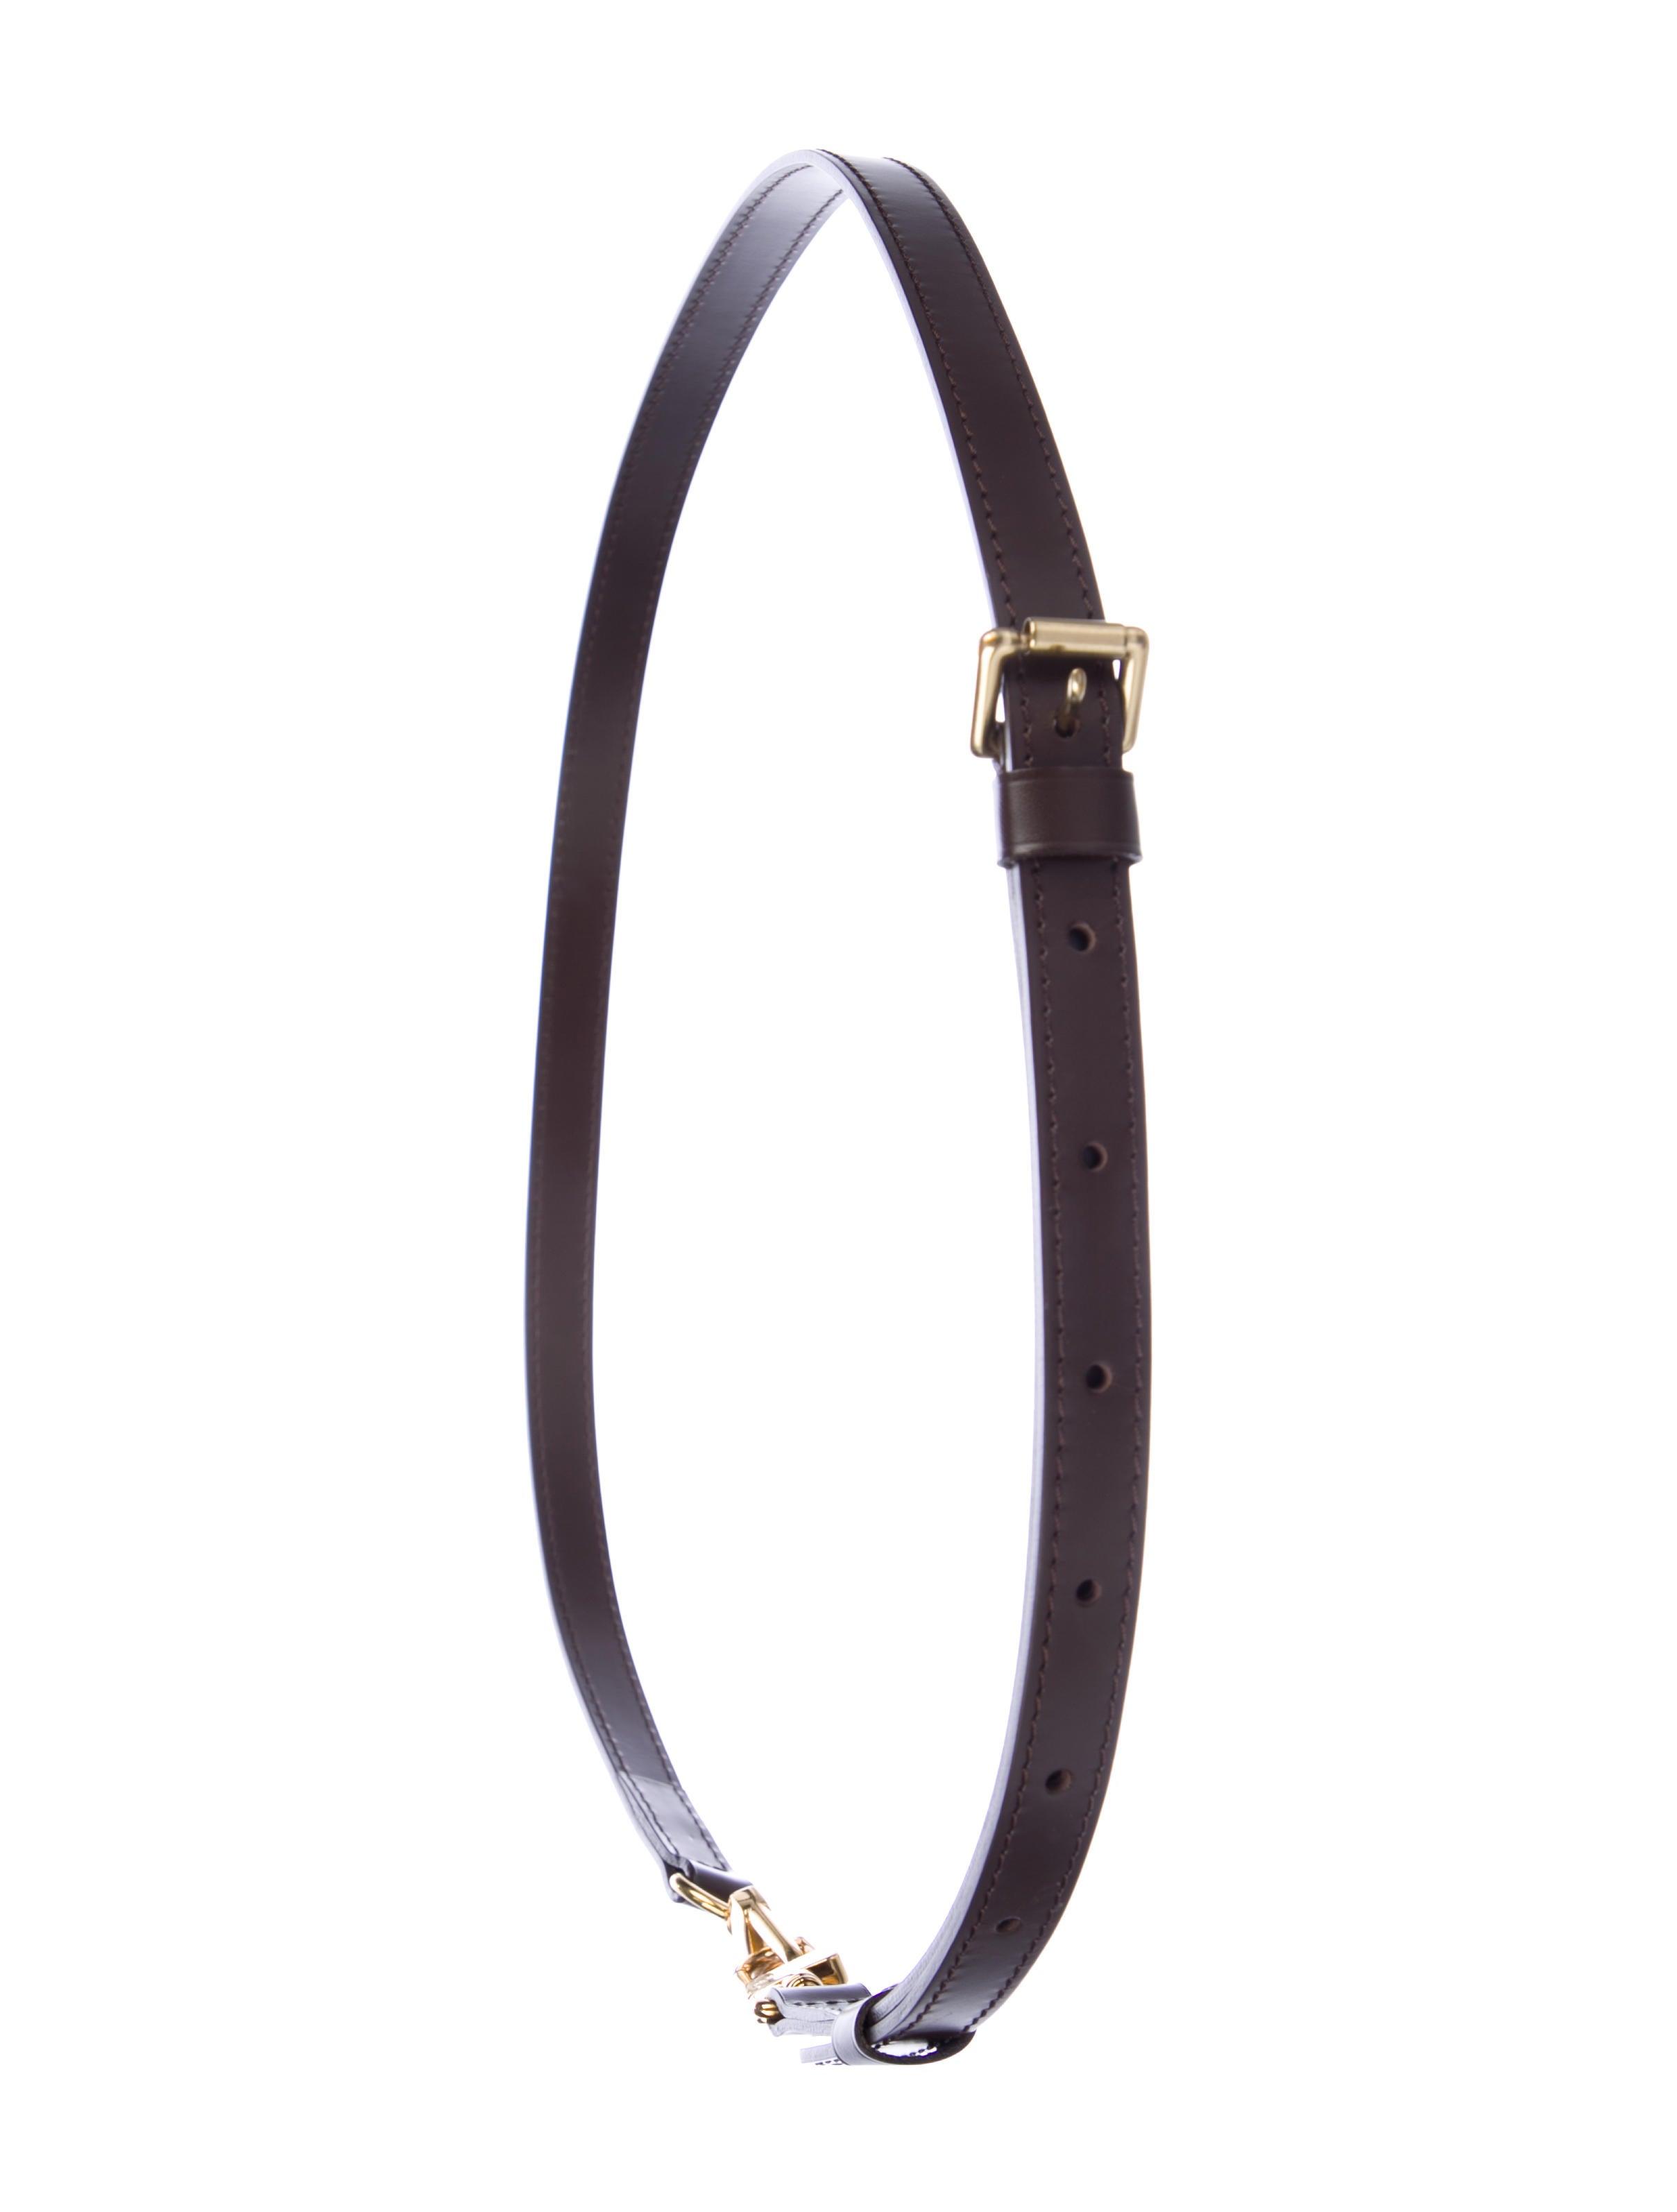 84057b5e441bc Louis Vuitton Adjustable Shoulder 16MM Ebene Shoulder Strap ...